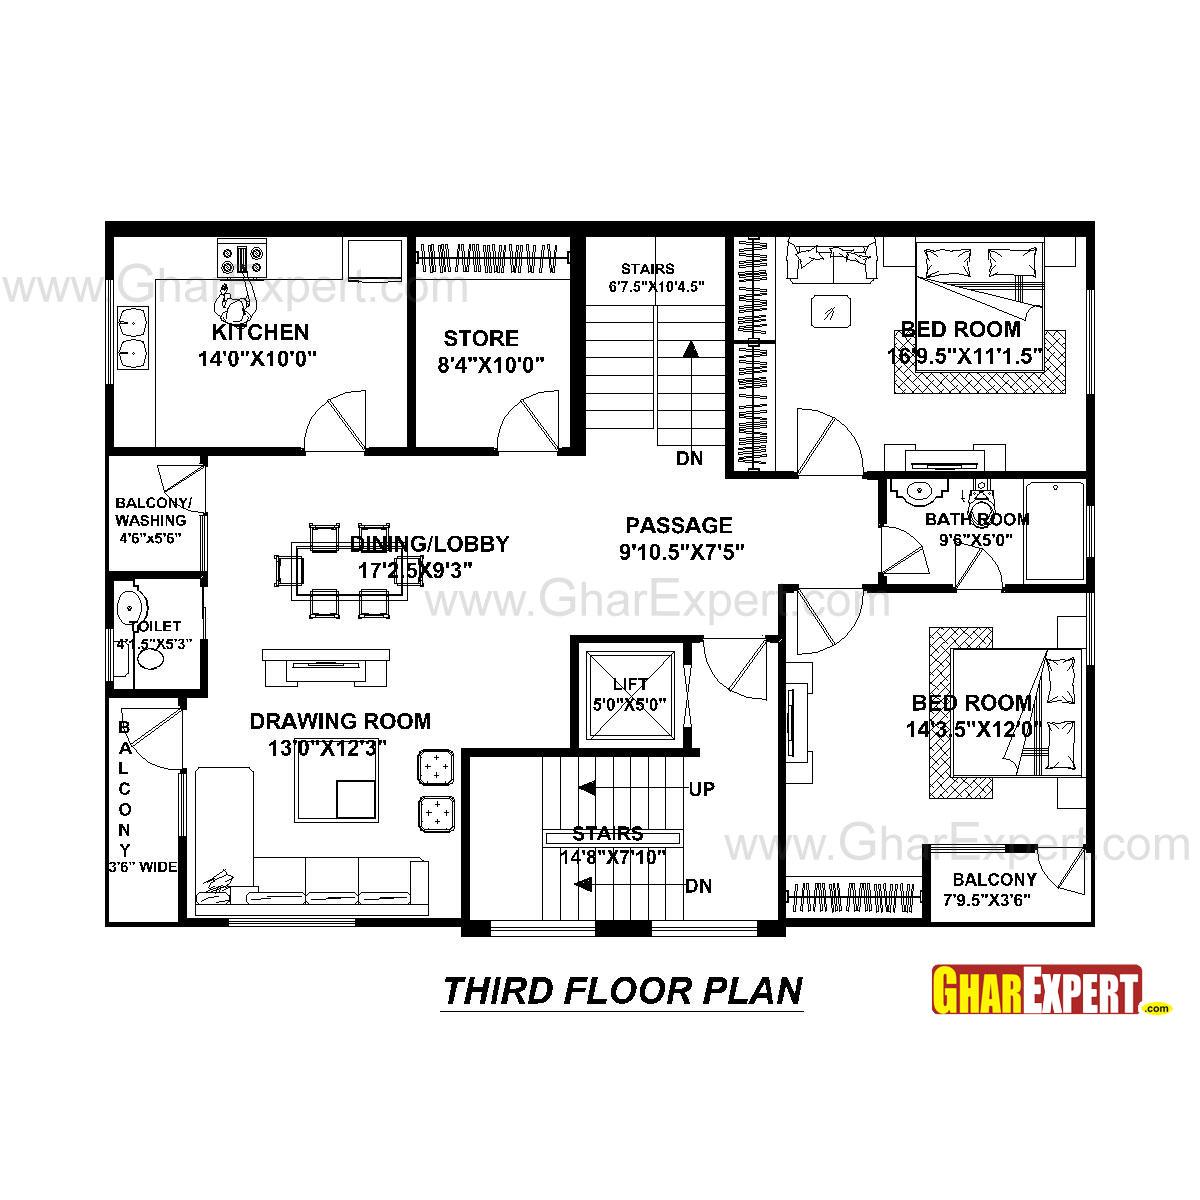 House Plan for 40 Feet by 30 Feet plot (Plot Size 133